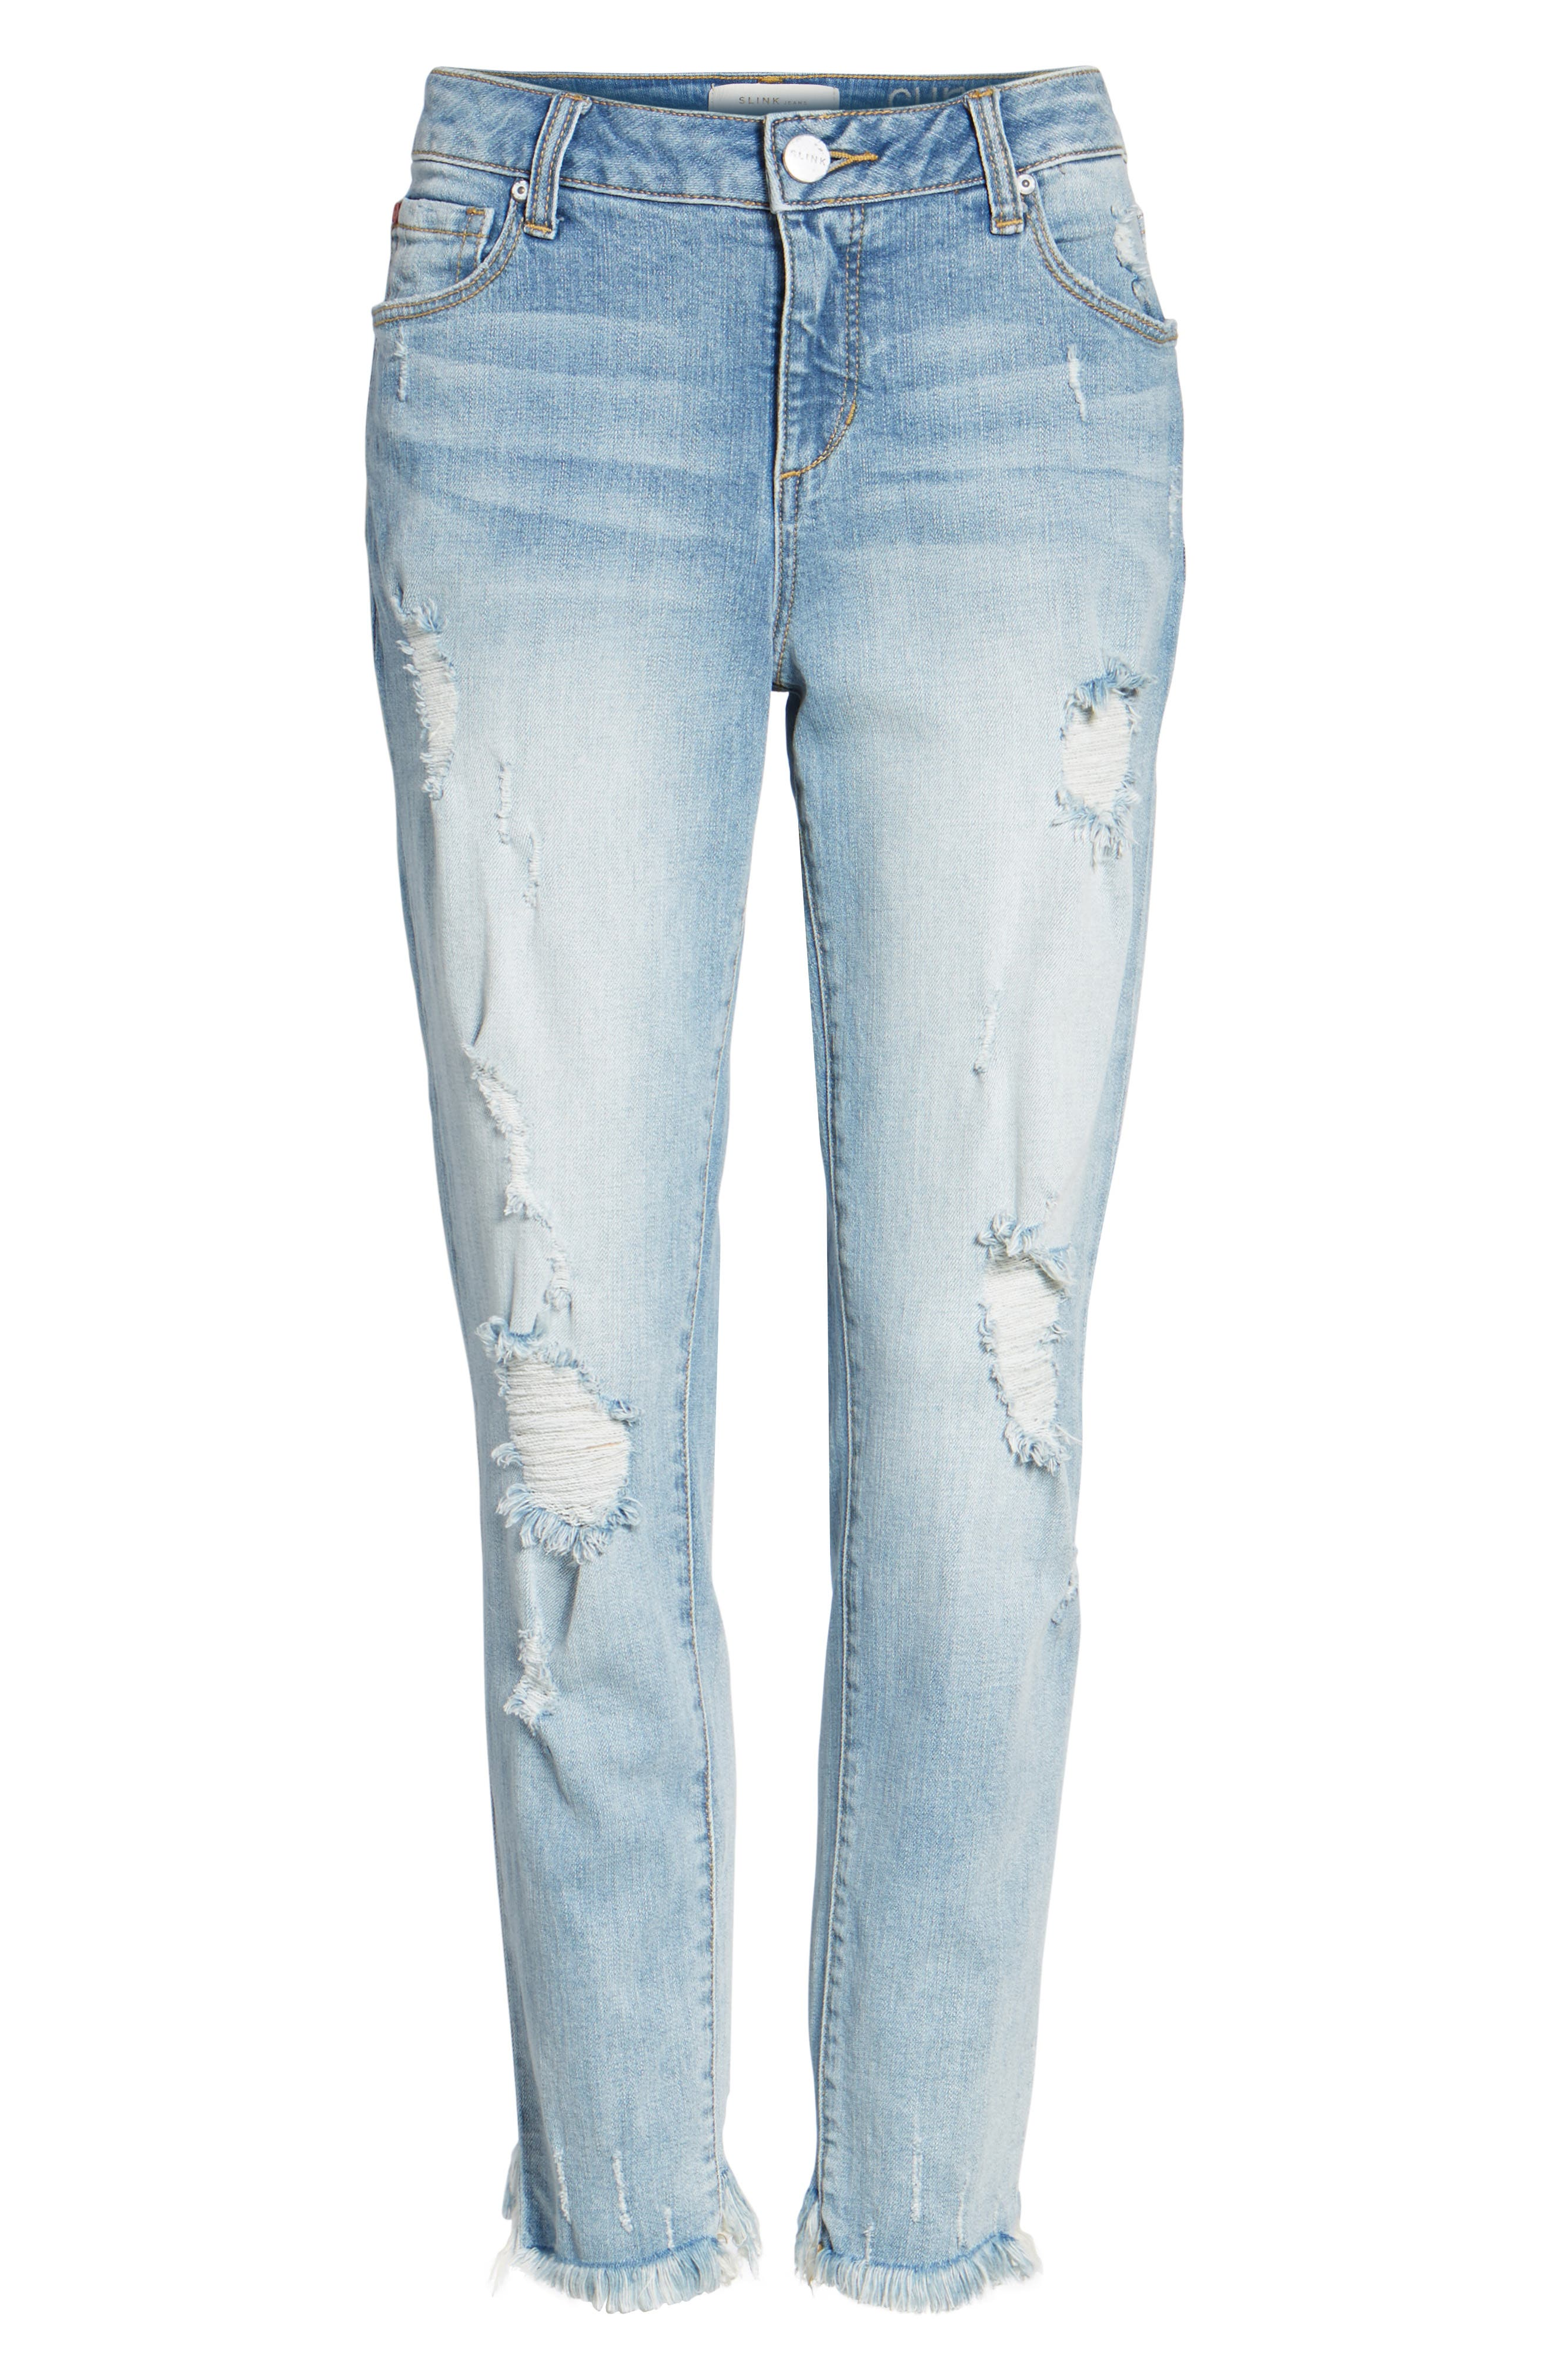 SLINK JEANS, Frayed Hem Easy Fit Ankle Jeans, Alternate thumbnail 6, color, MAGGIE